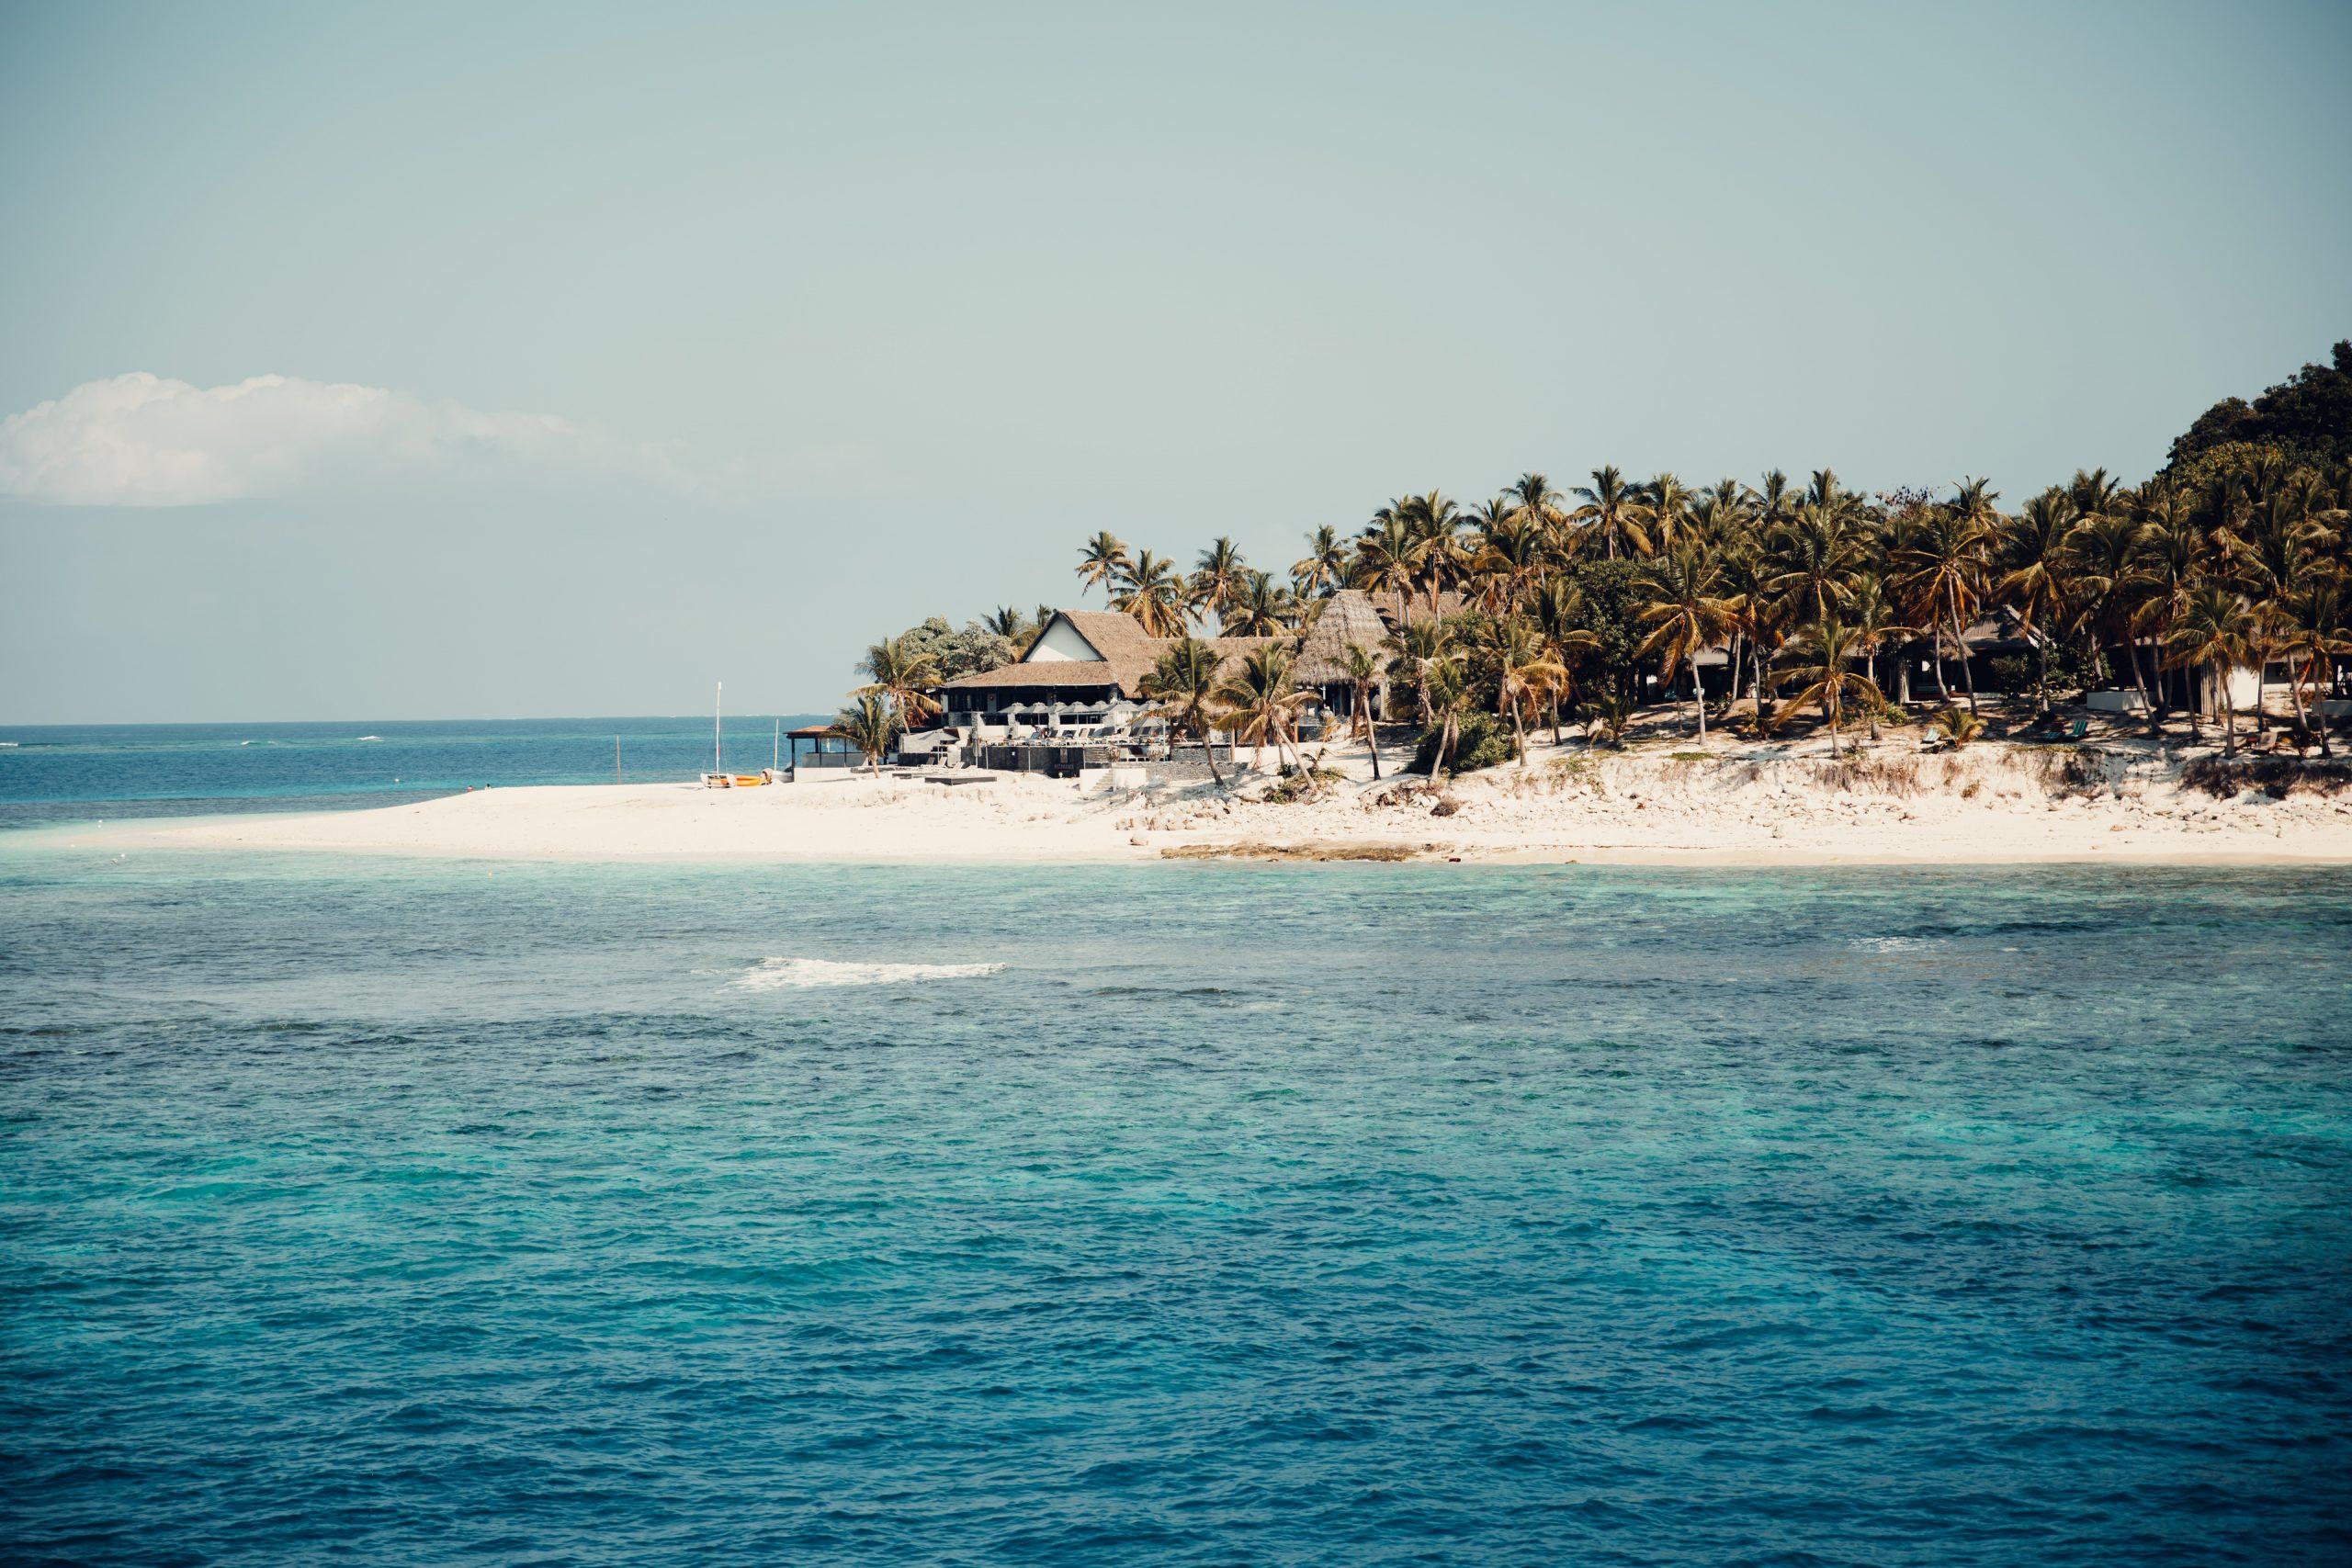 beach hut on an island in fiji overlooking blue ocean water and reef